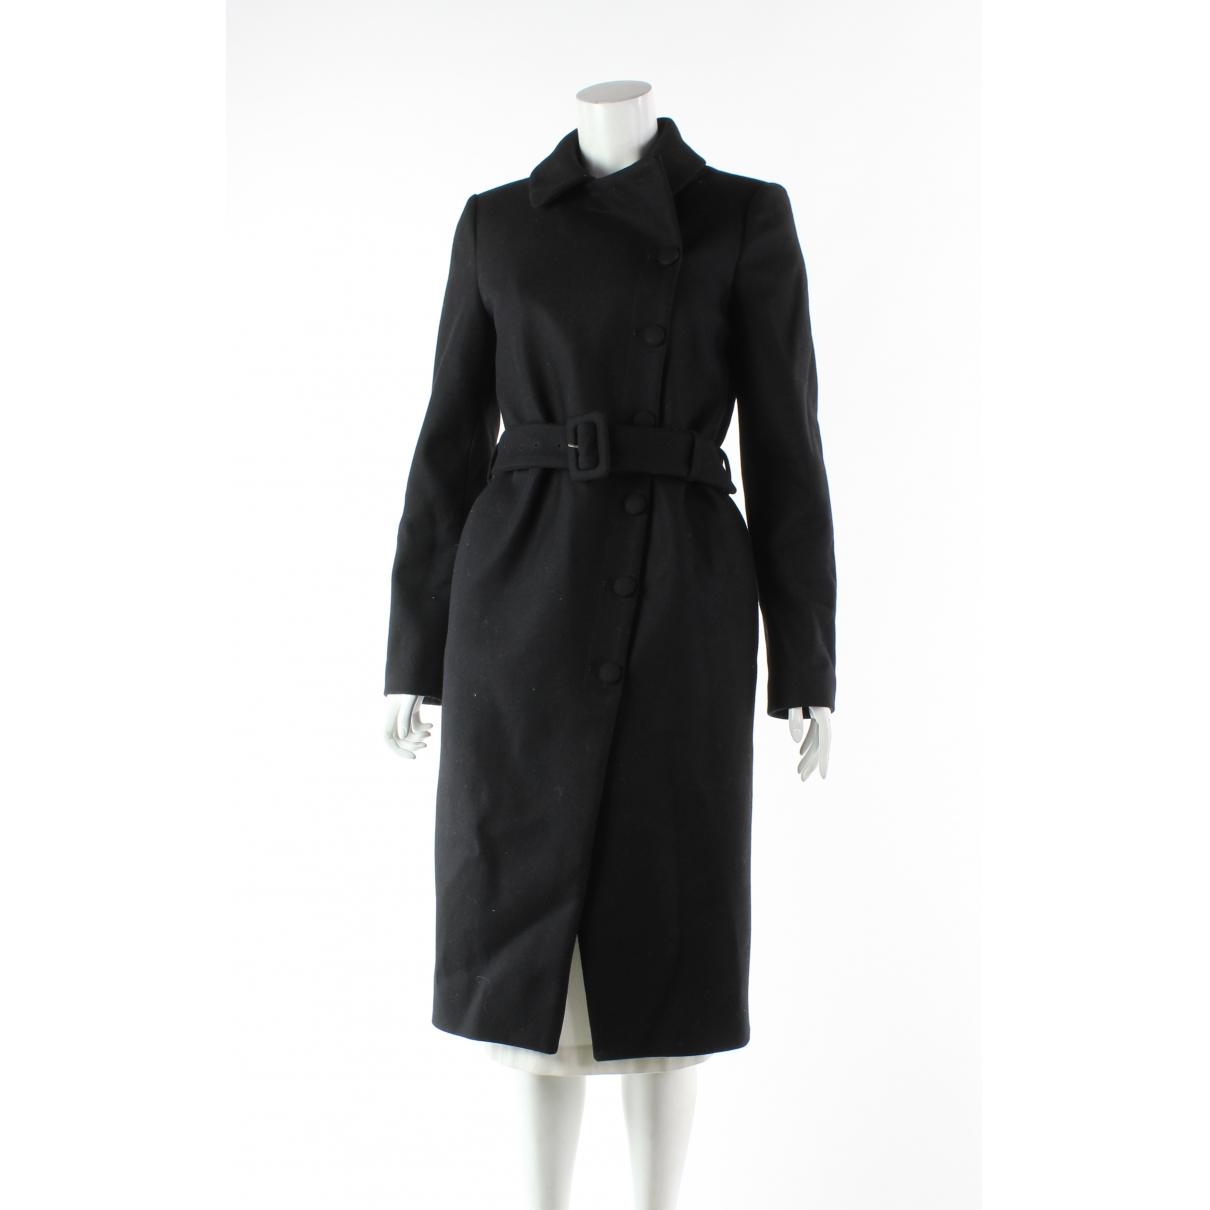 Moschino \N Black Wool coat for Women 8 UK